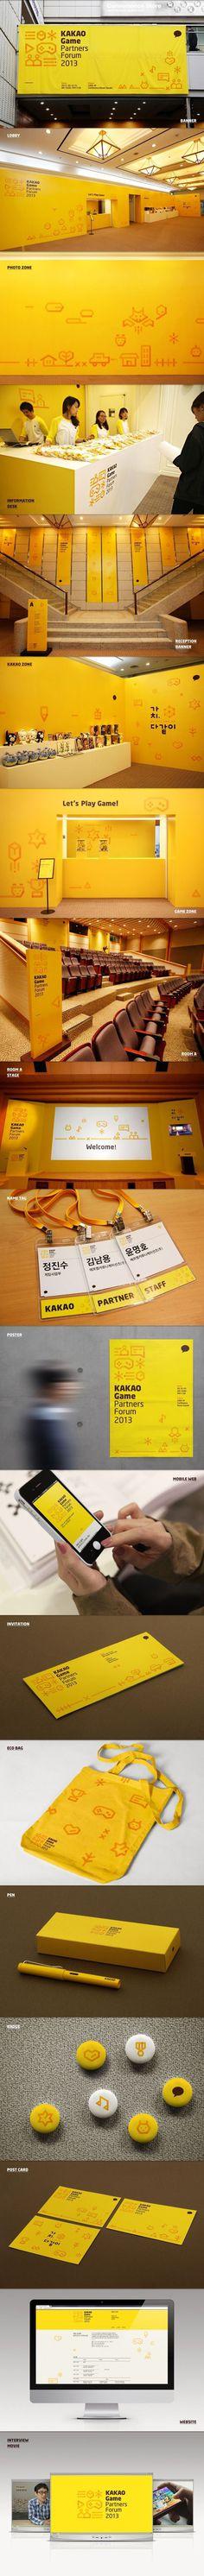 Kakao Game #brand #identity